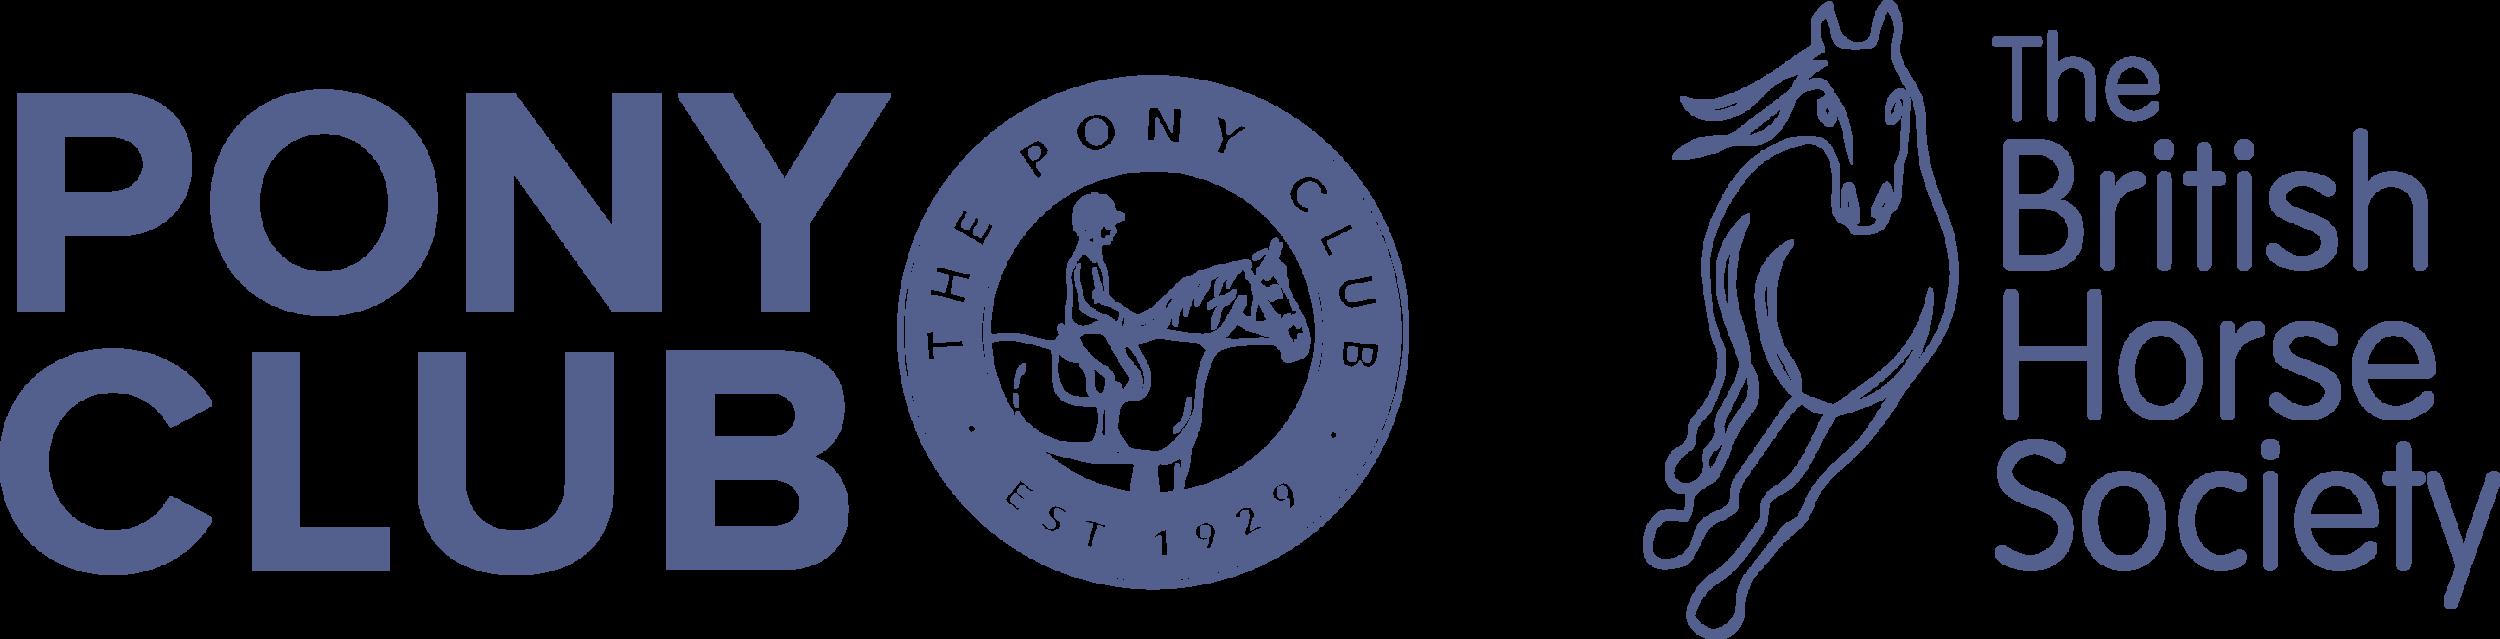 Horse club logos-01.png